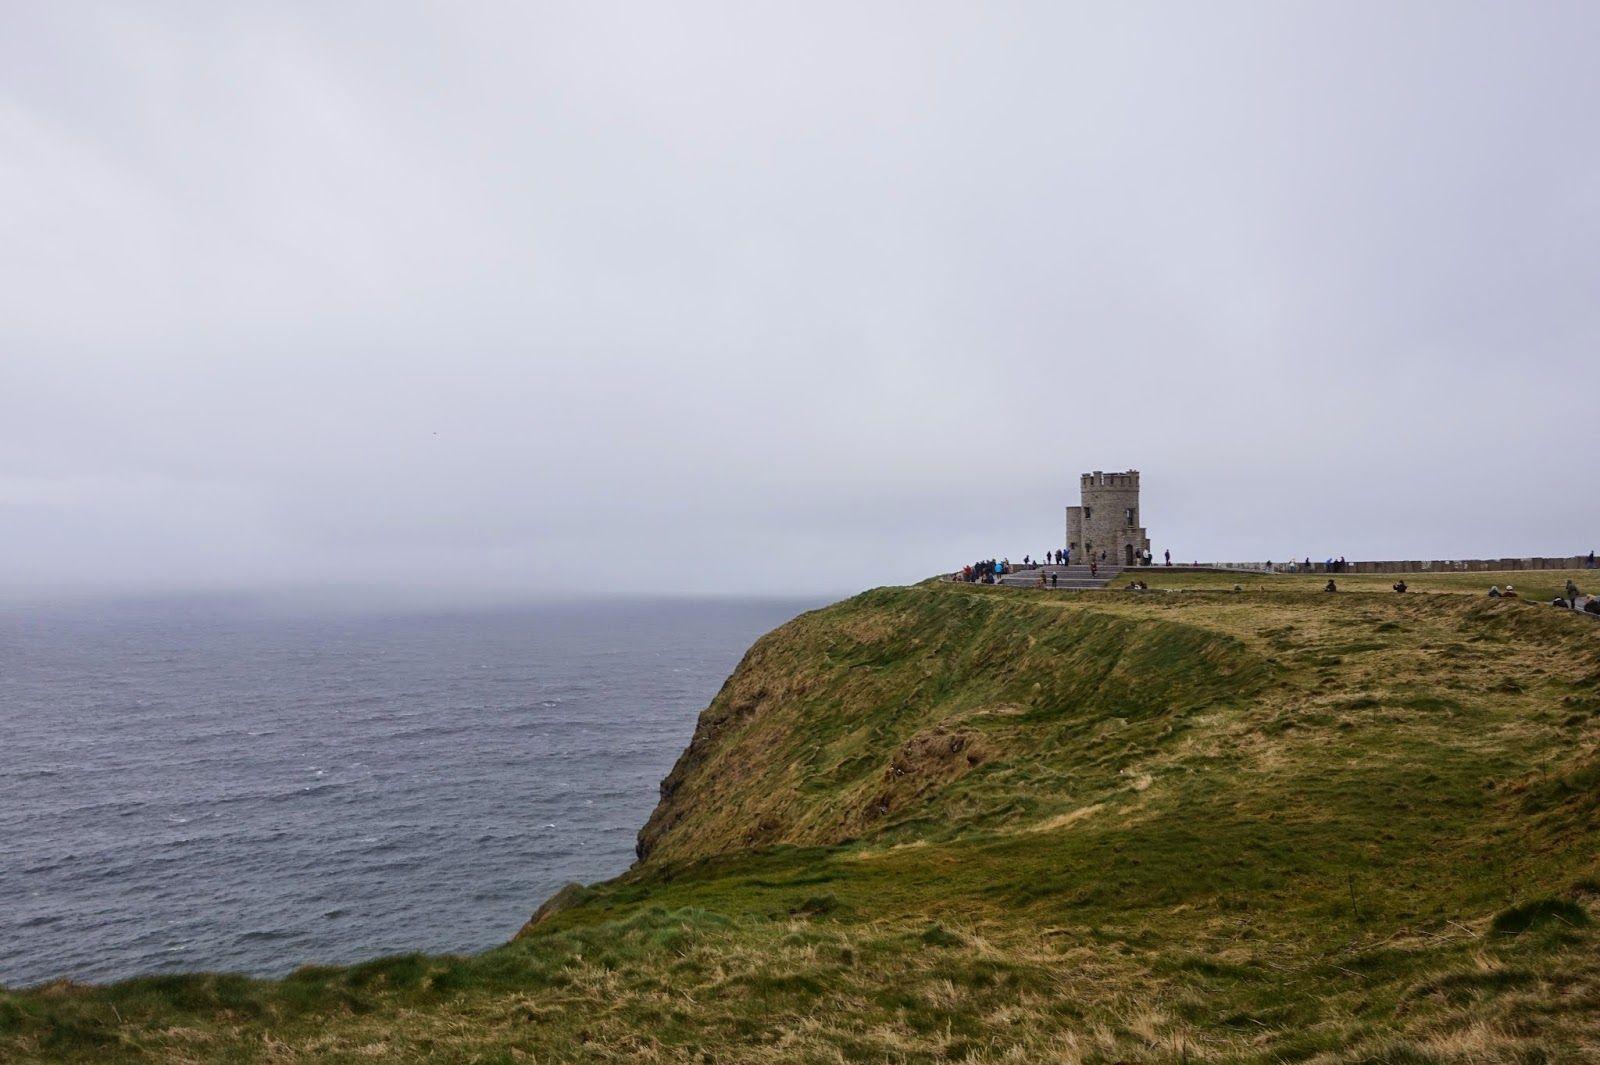 Hepburn and Handbags: Finding Good 'Craic' In Ireland